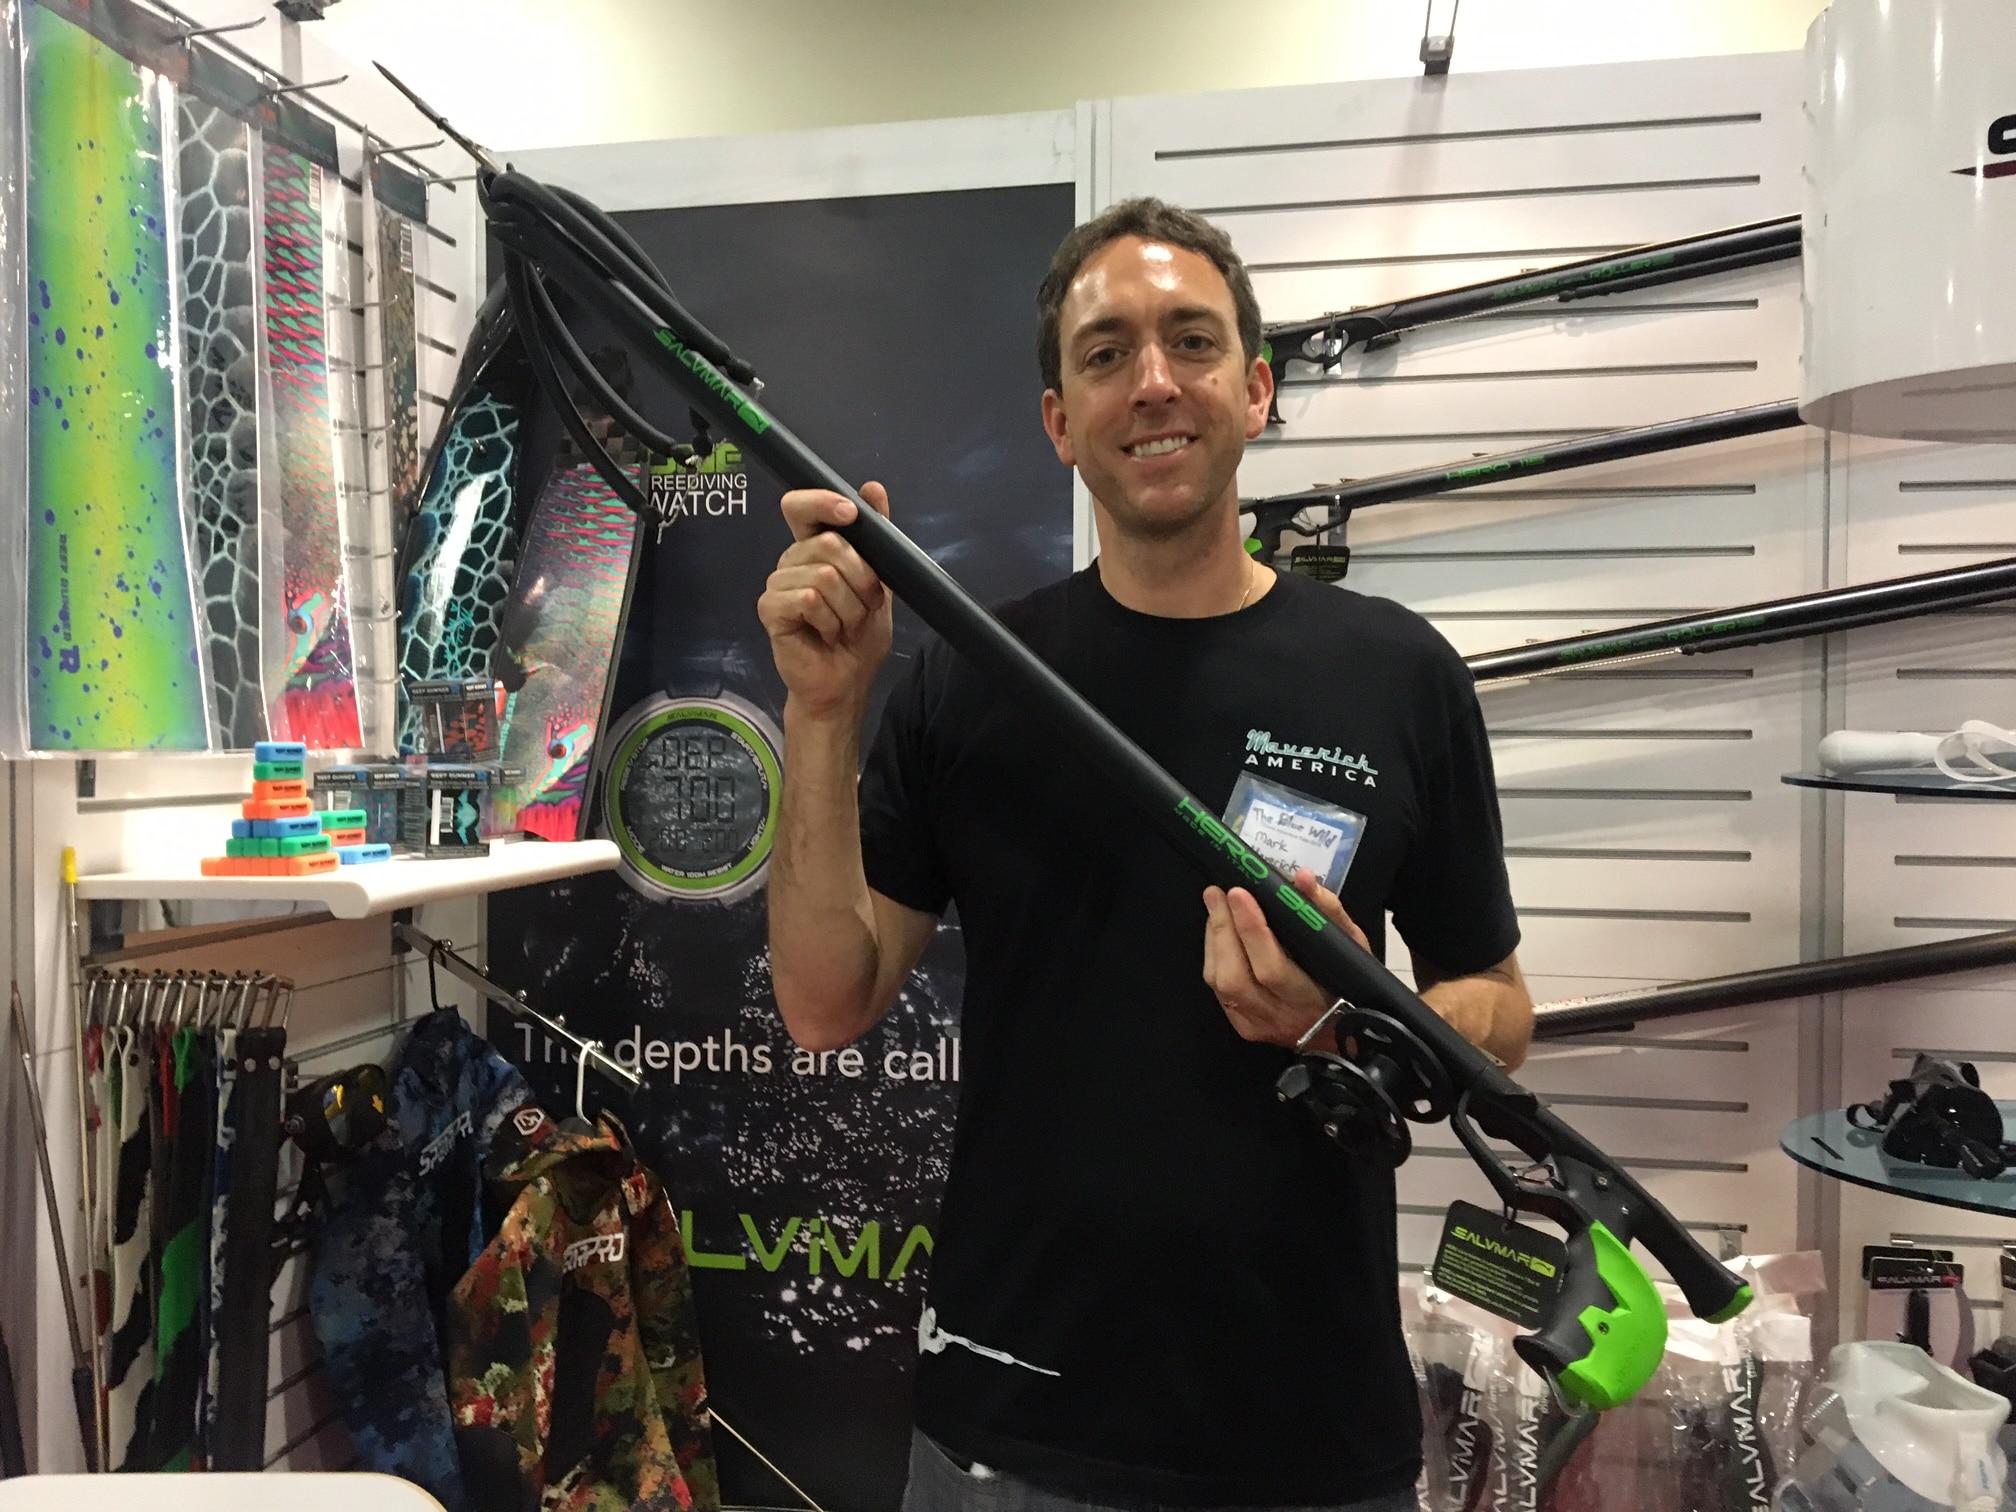 Maverick America's Mark Laboccetta with Salvimar's latest speargun, the Hero 95.